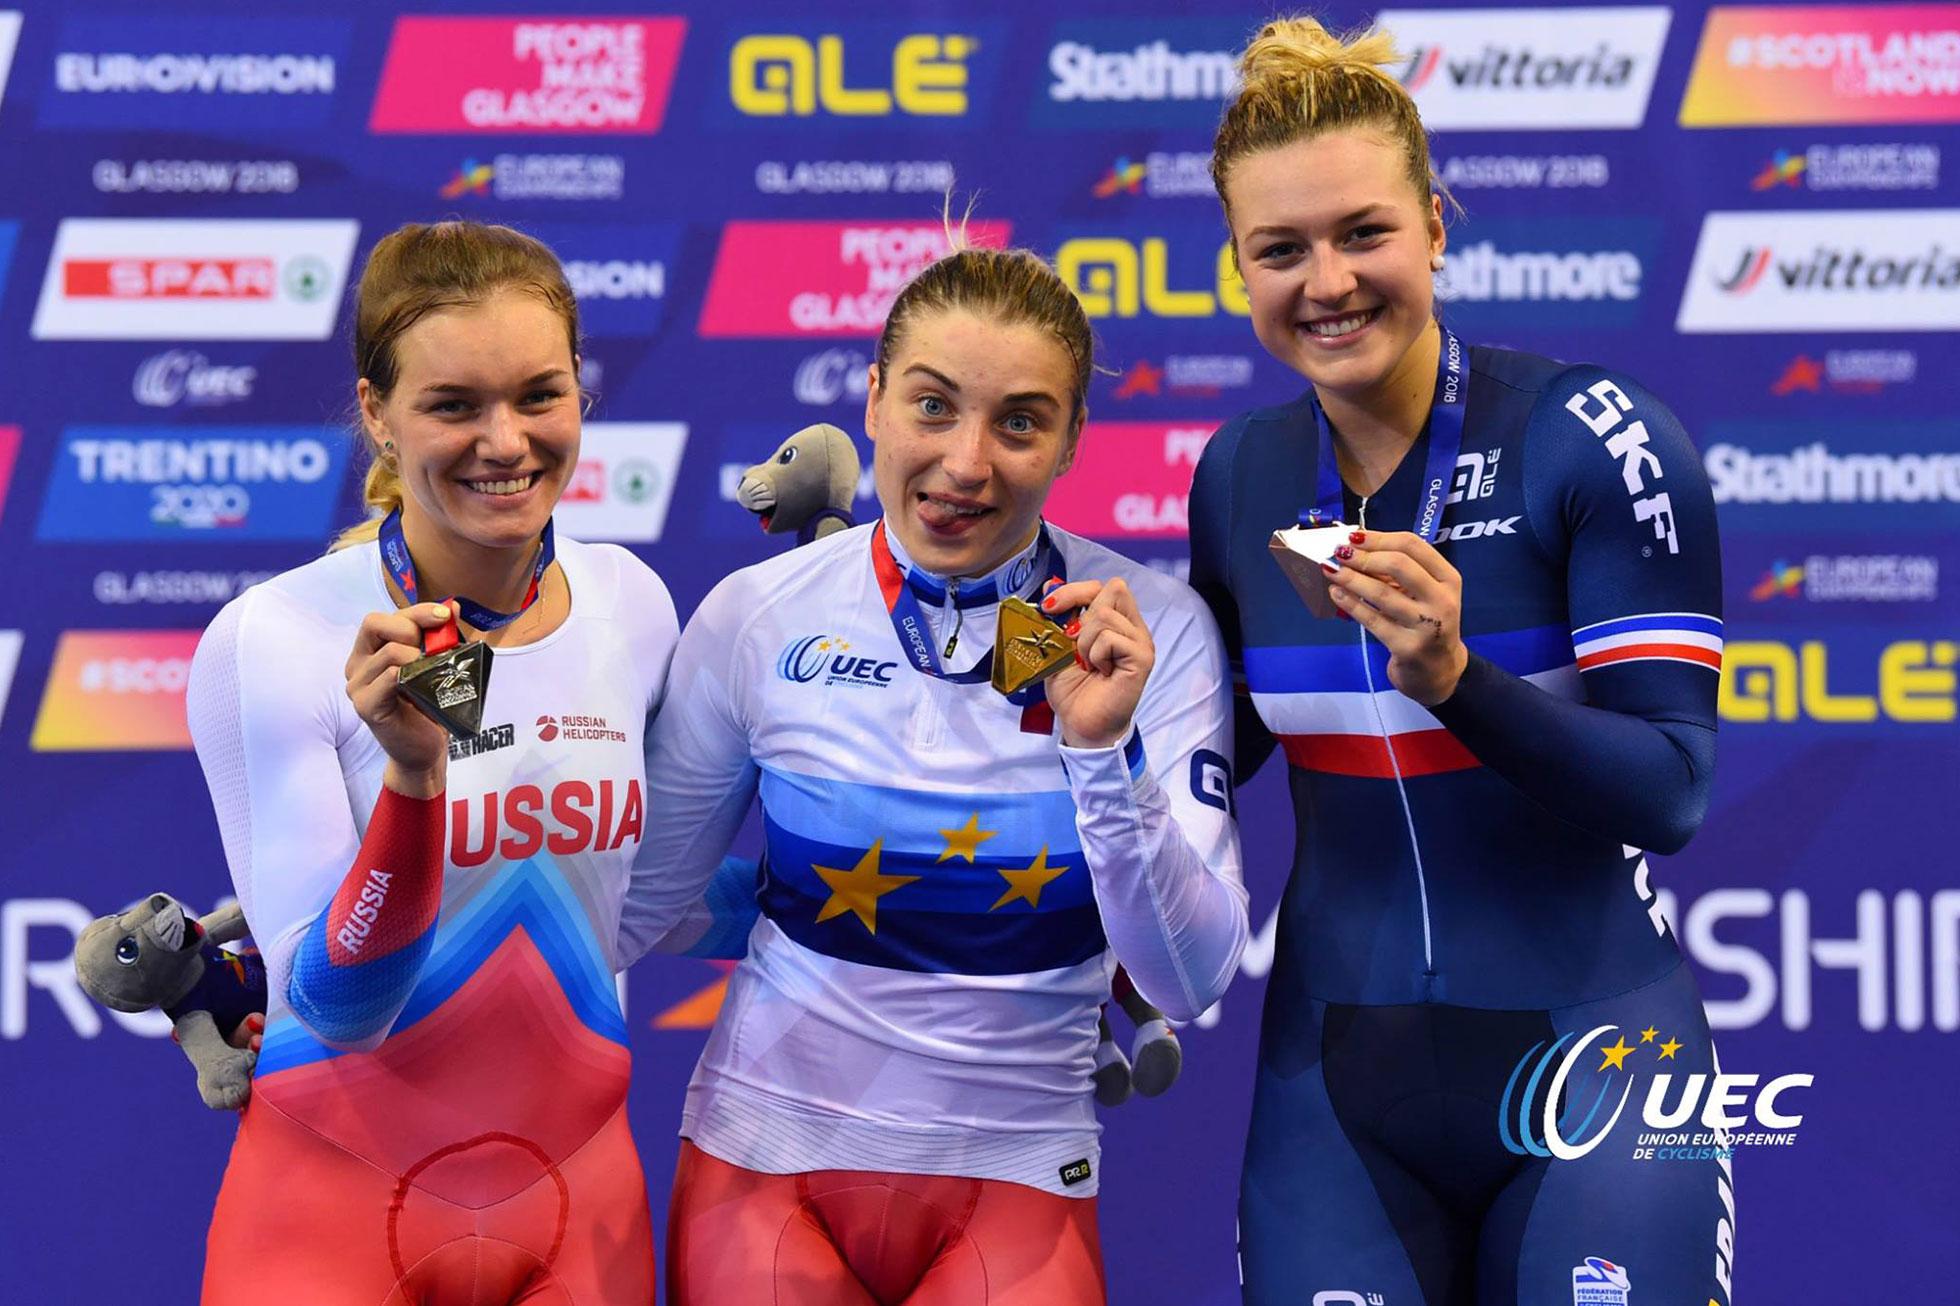 UECトラックヨーロッパ選手権2018・女子スプリント